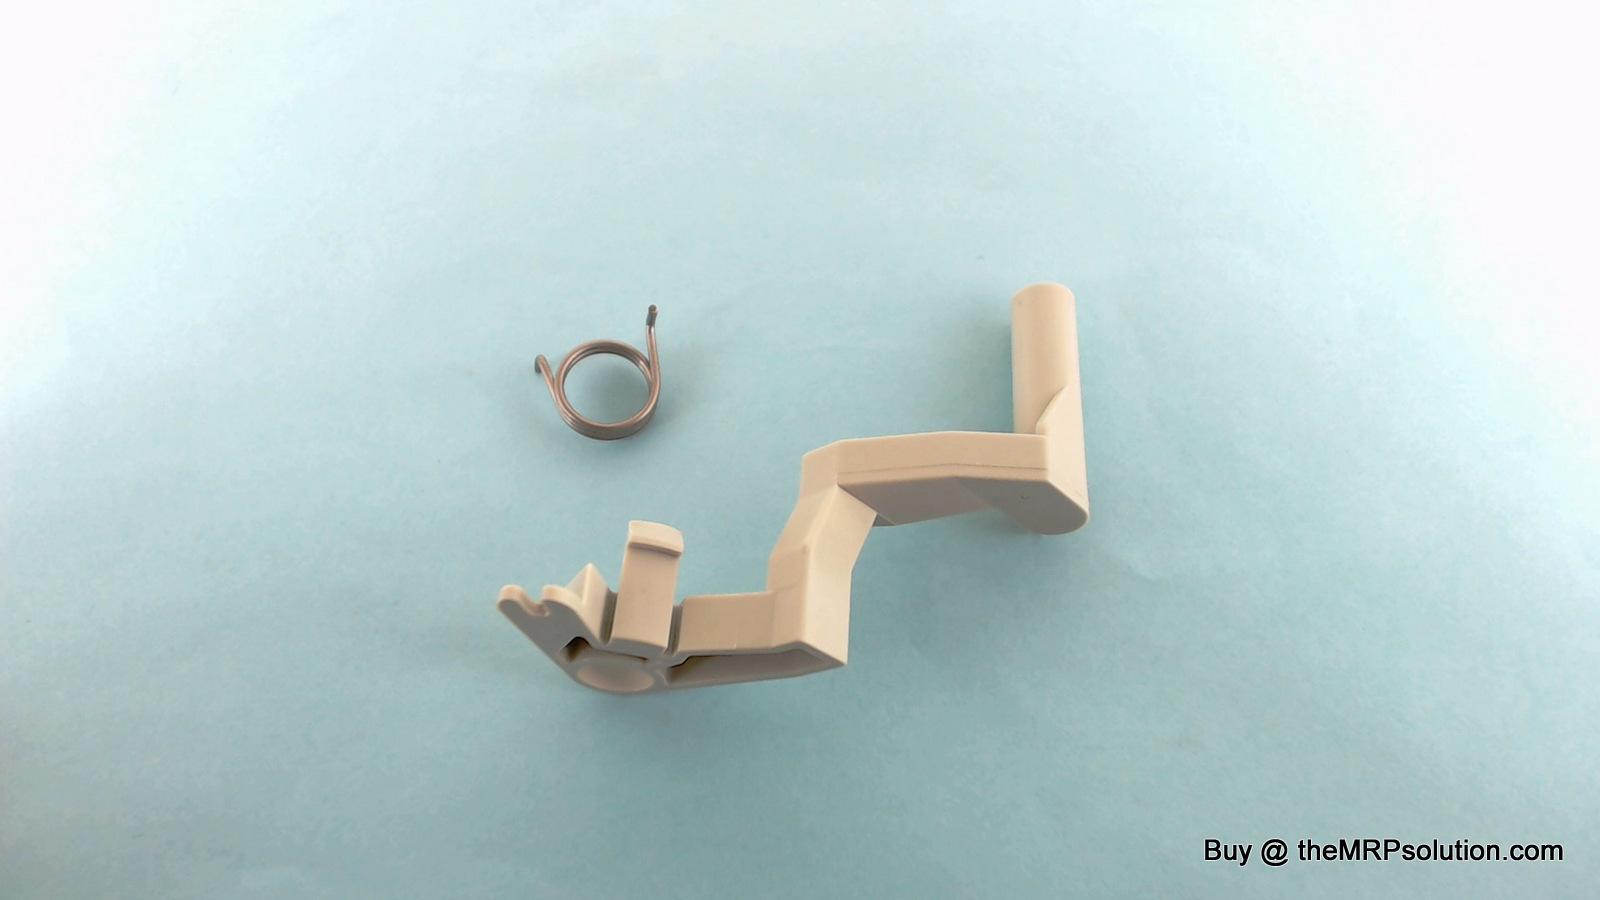 OKIDATA 53489201 BAIL ARM (R), ML320 Refurbished